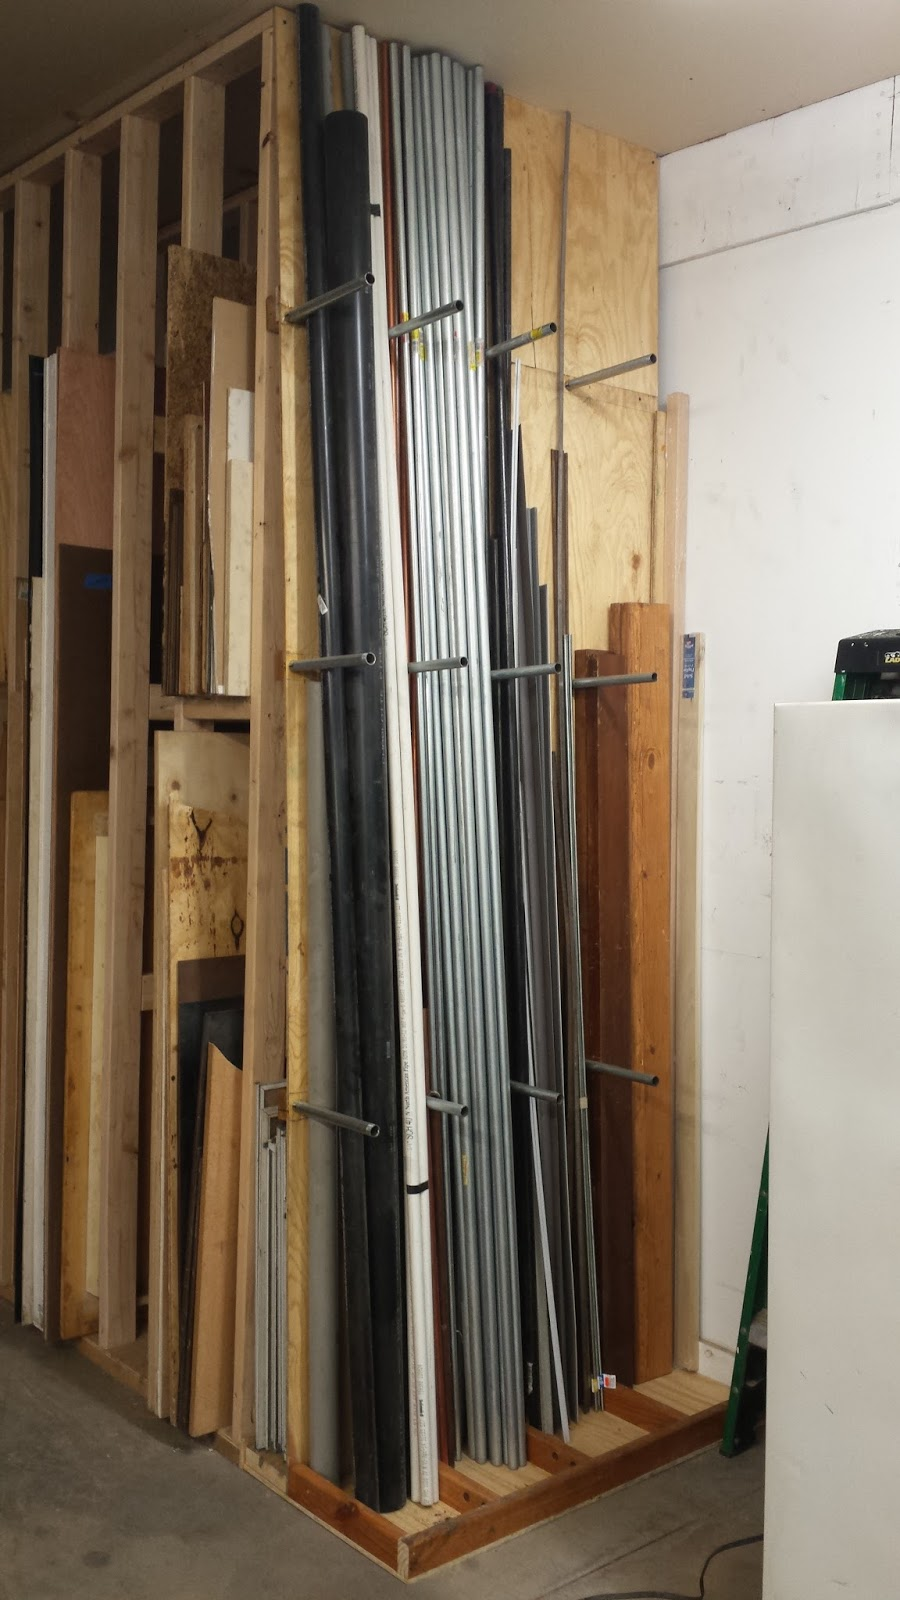 MRX Designs: Vertical Pipe Storage Rack